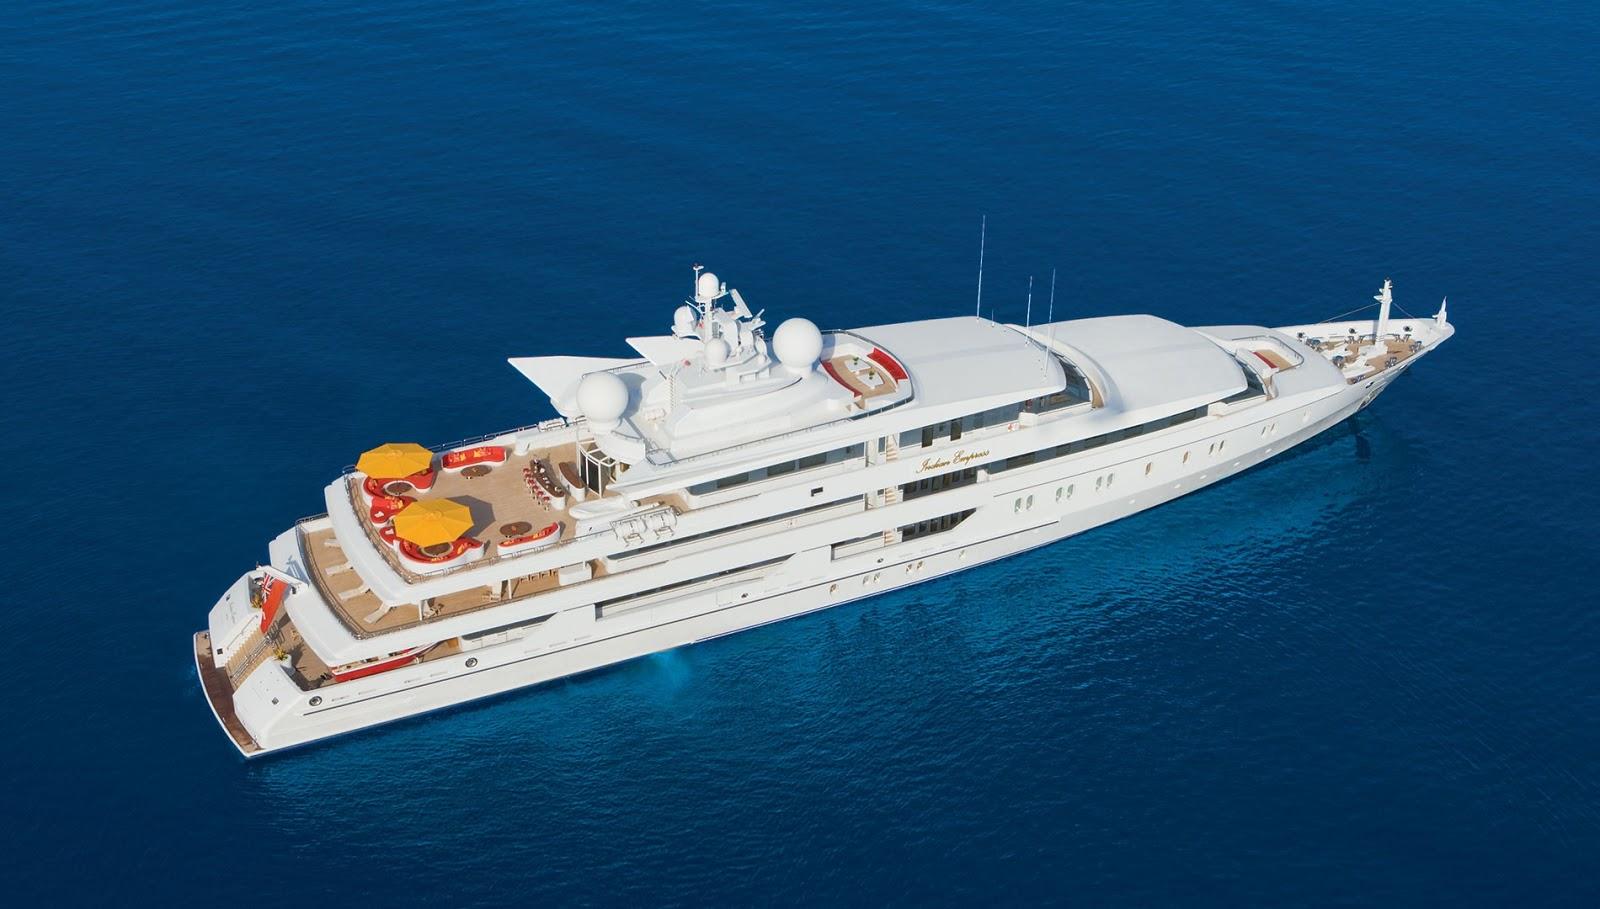 INDIAN EMPRESS Megayacht